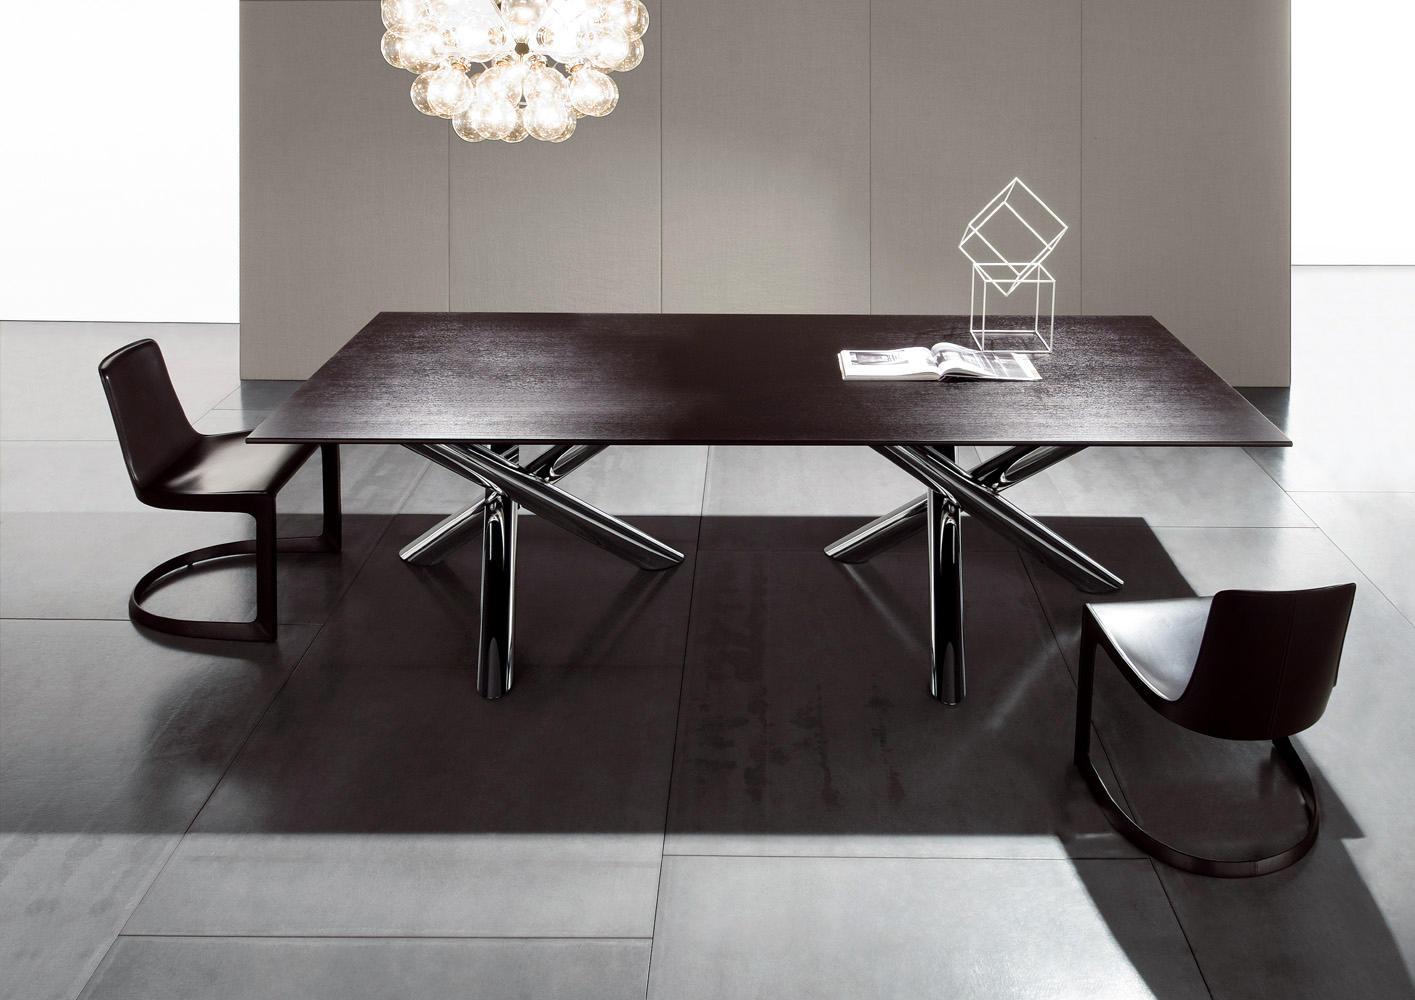 VAN DYCK TABLE Restaurant tables from Minotti Architonic : Tavoli VAN DYCK 10 b from www.architonic.com size 1415 x 1000 jpeg 167kB